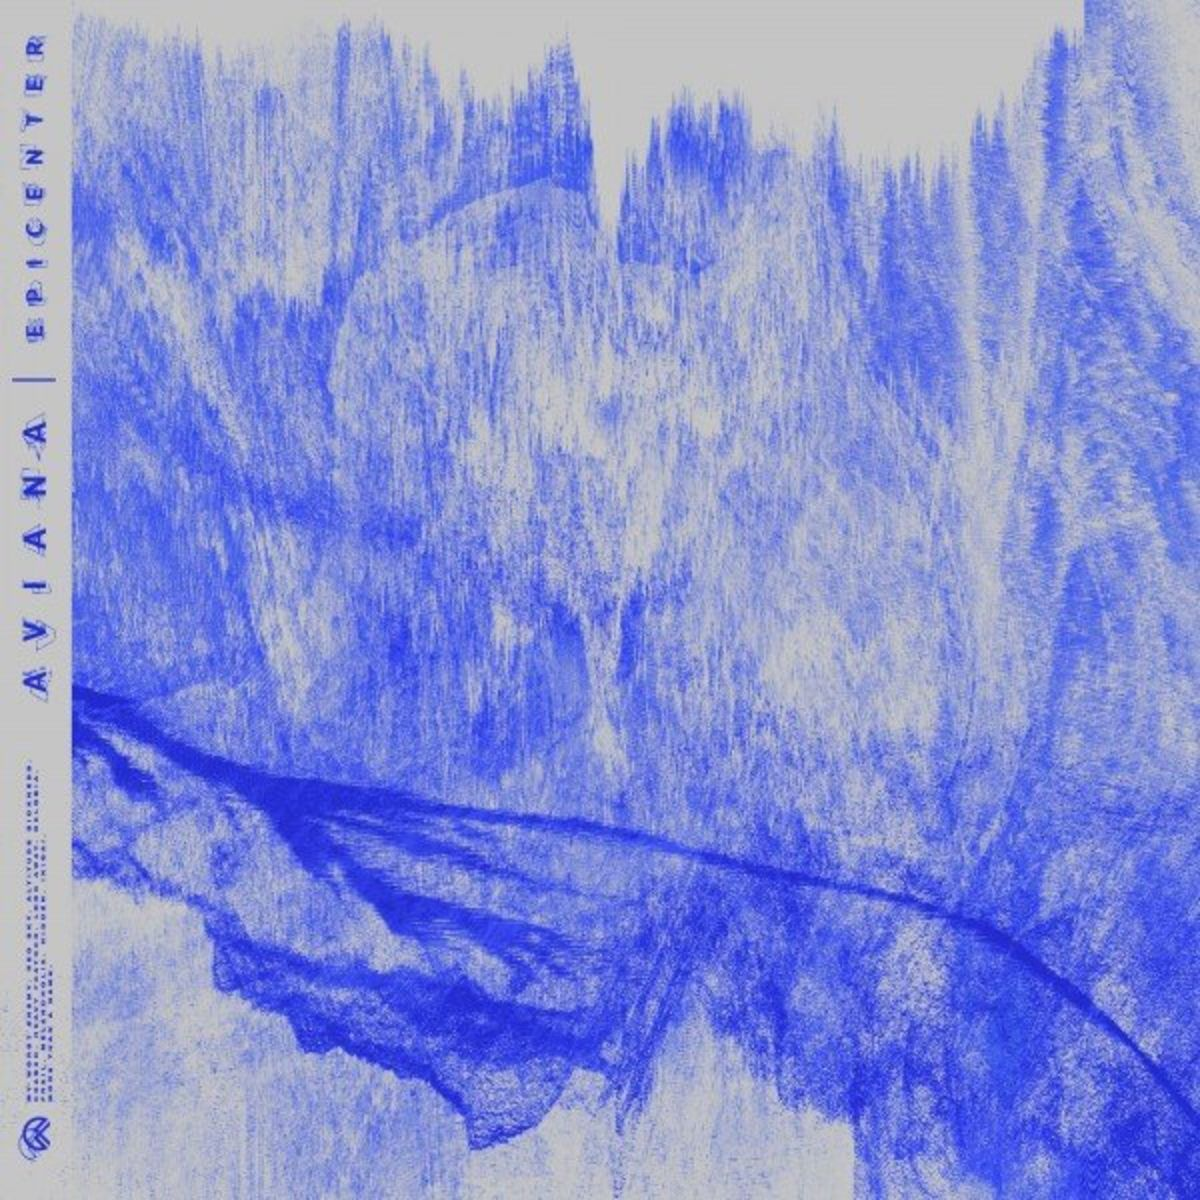 Aviana - Epicenter (Instrumental) (2020)